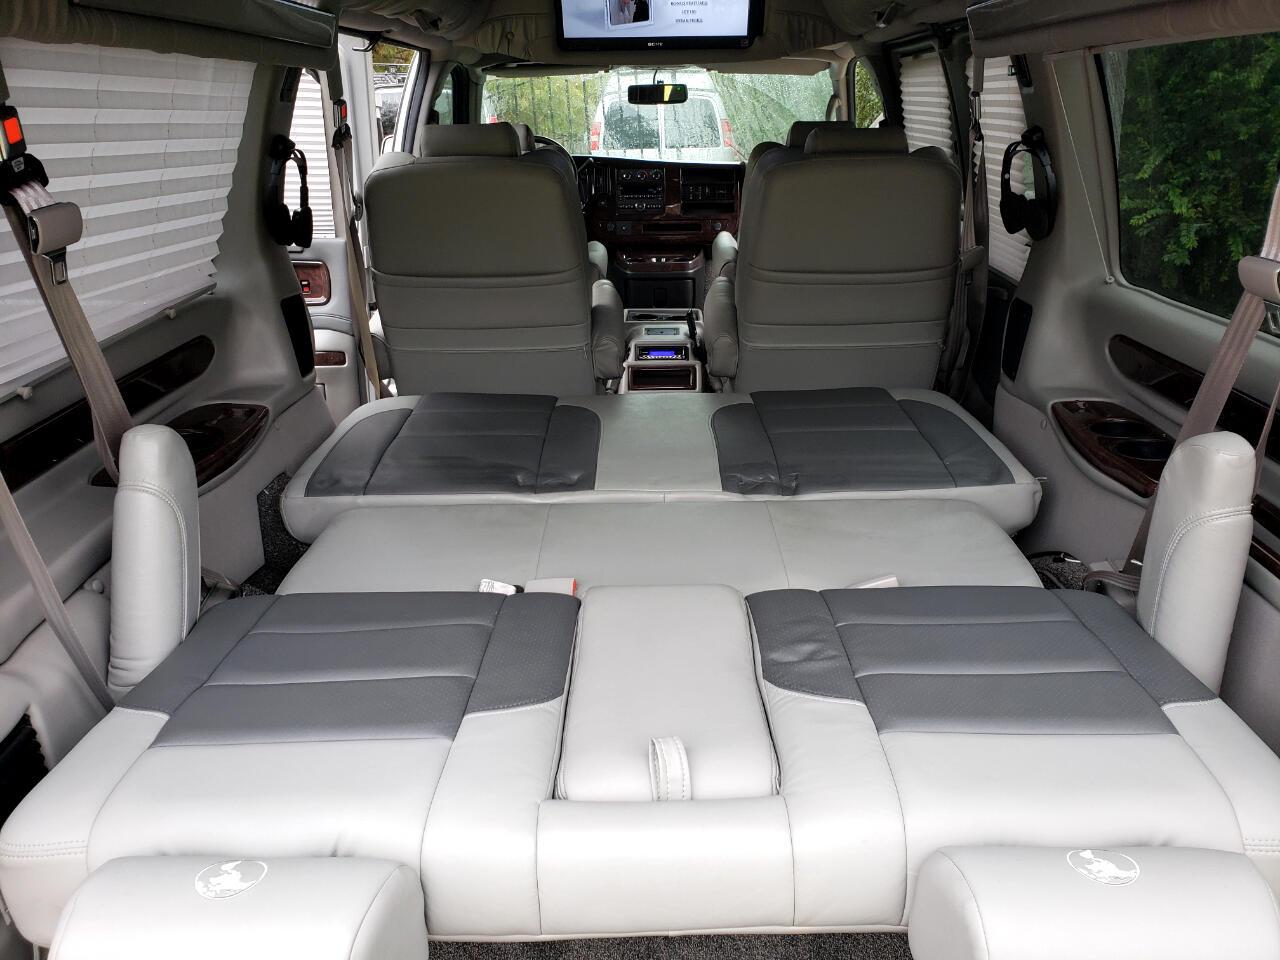 2010 Chevrolet Express Express 1500 Hightop Explorer Limited SE Conversio